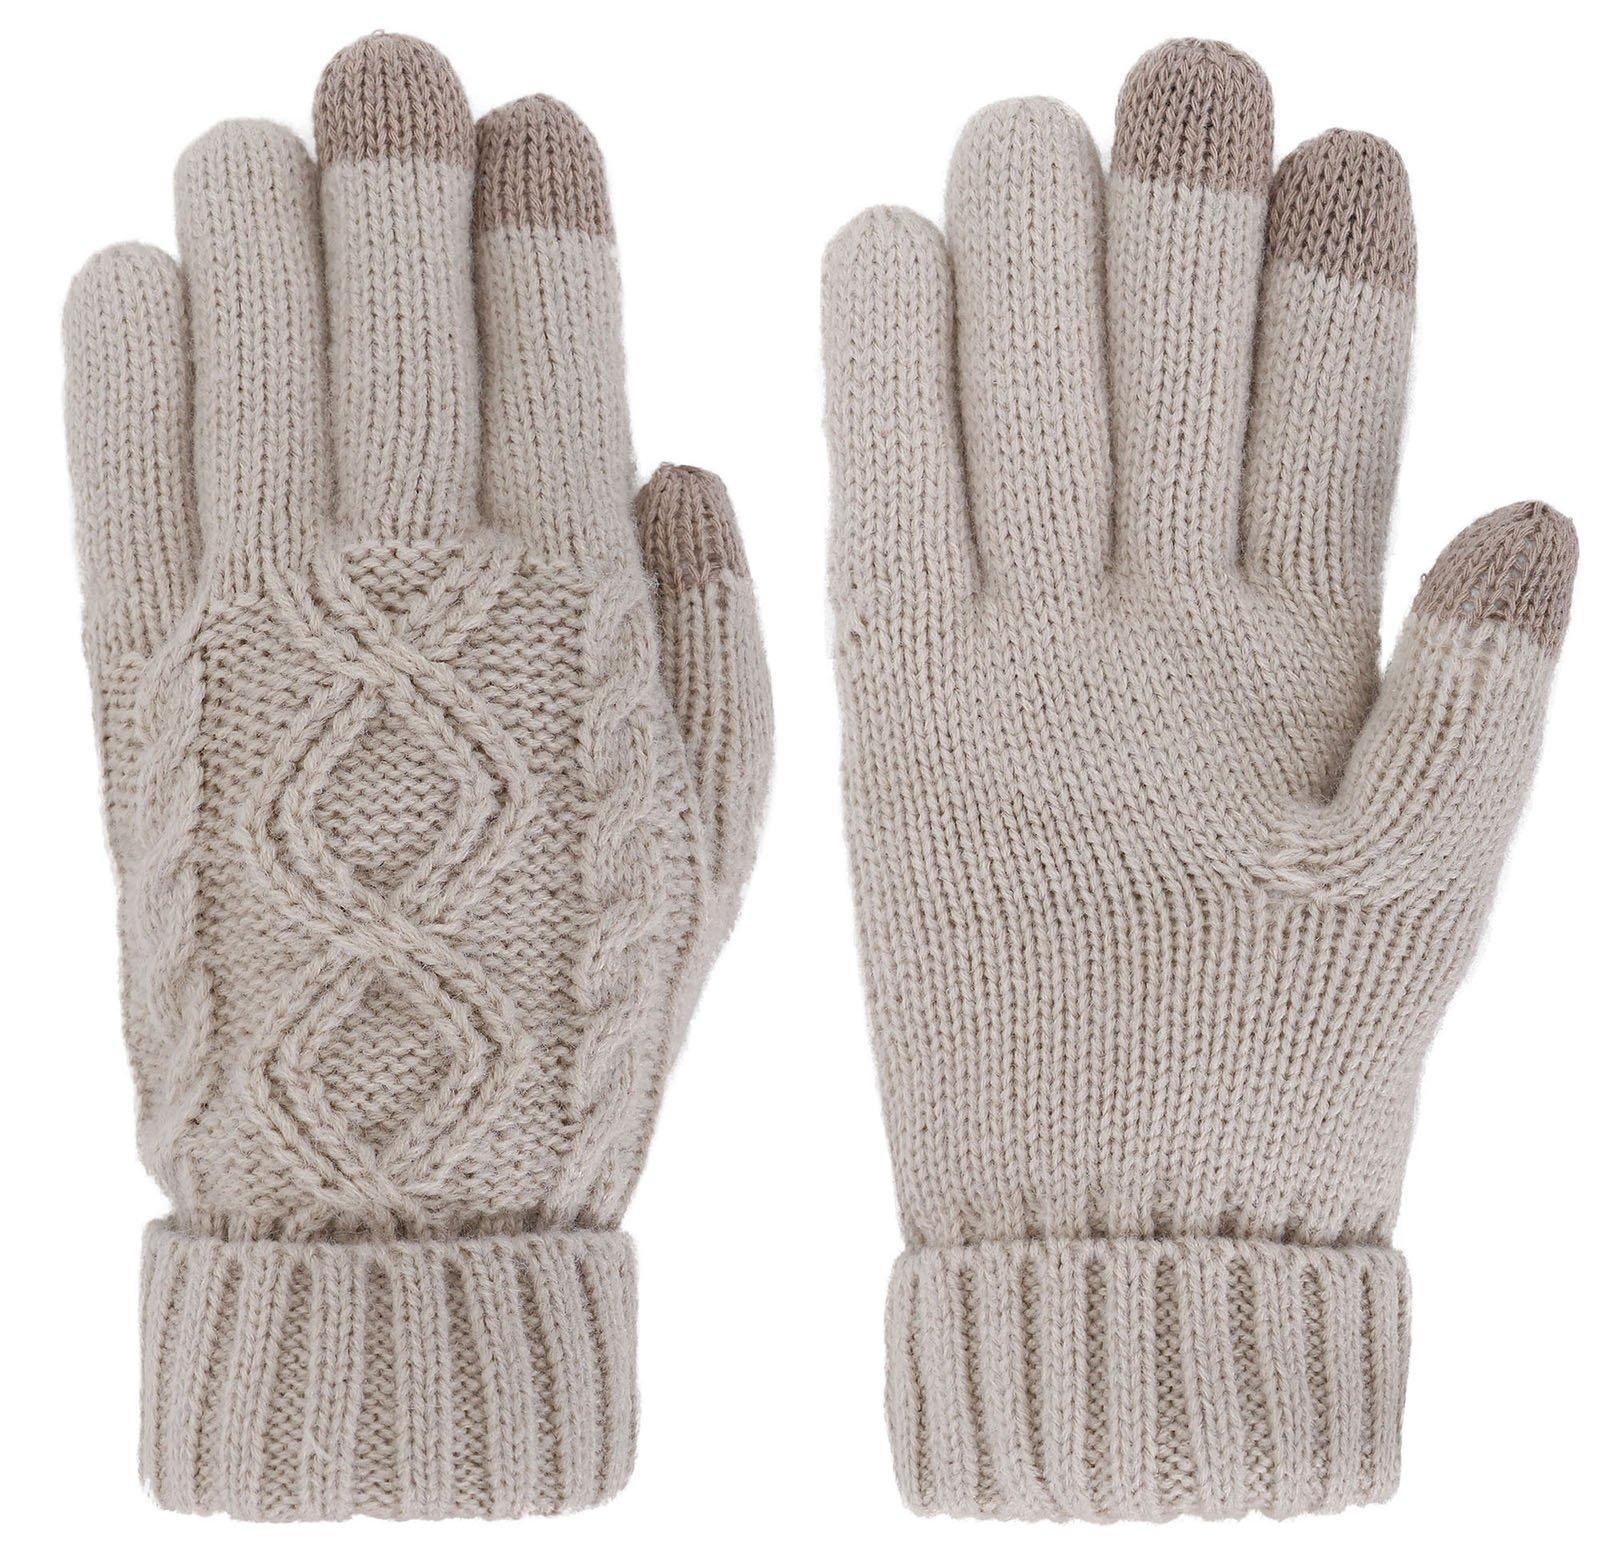 Women's Cable Knit 3 Finger Touchscreen Winter Mitten Gloves,Latte